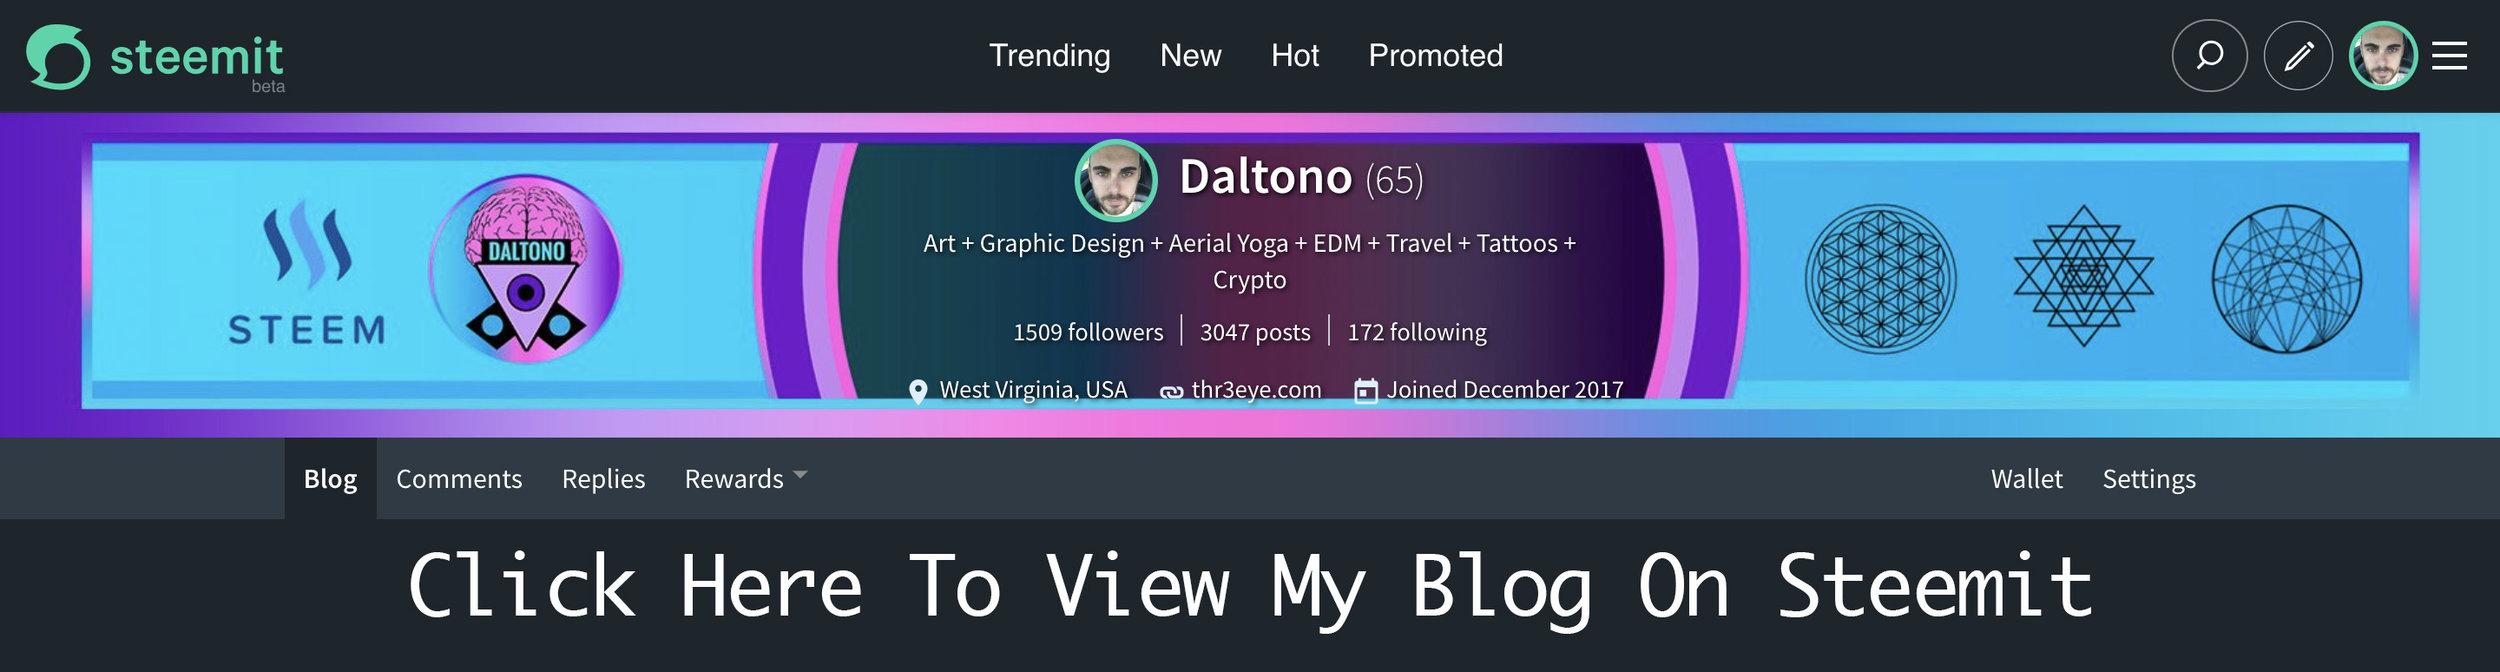 view-my-blog.jpg